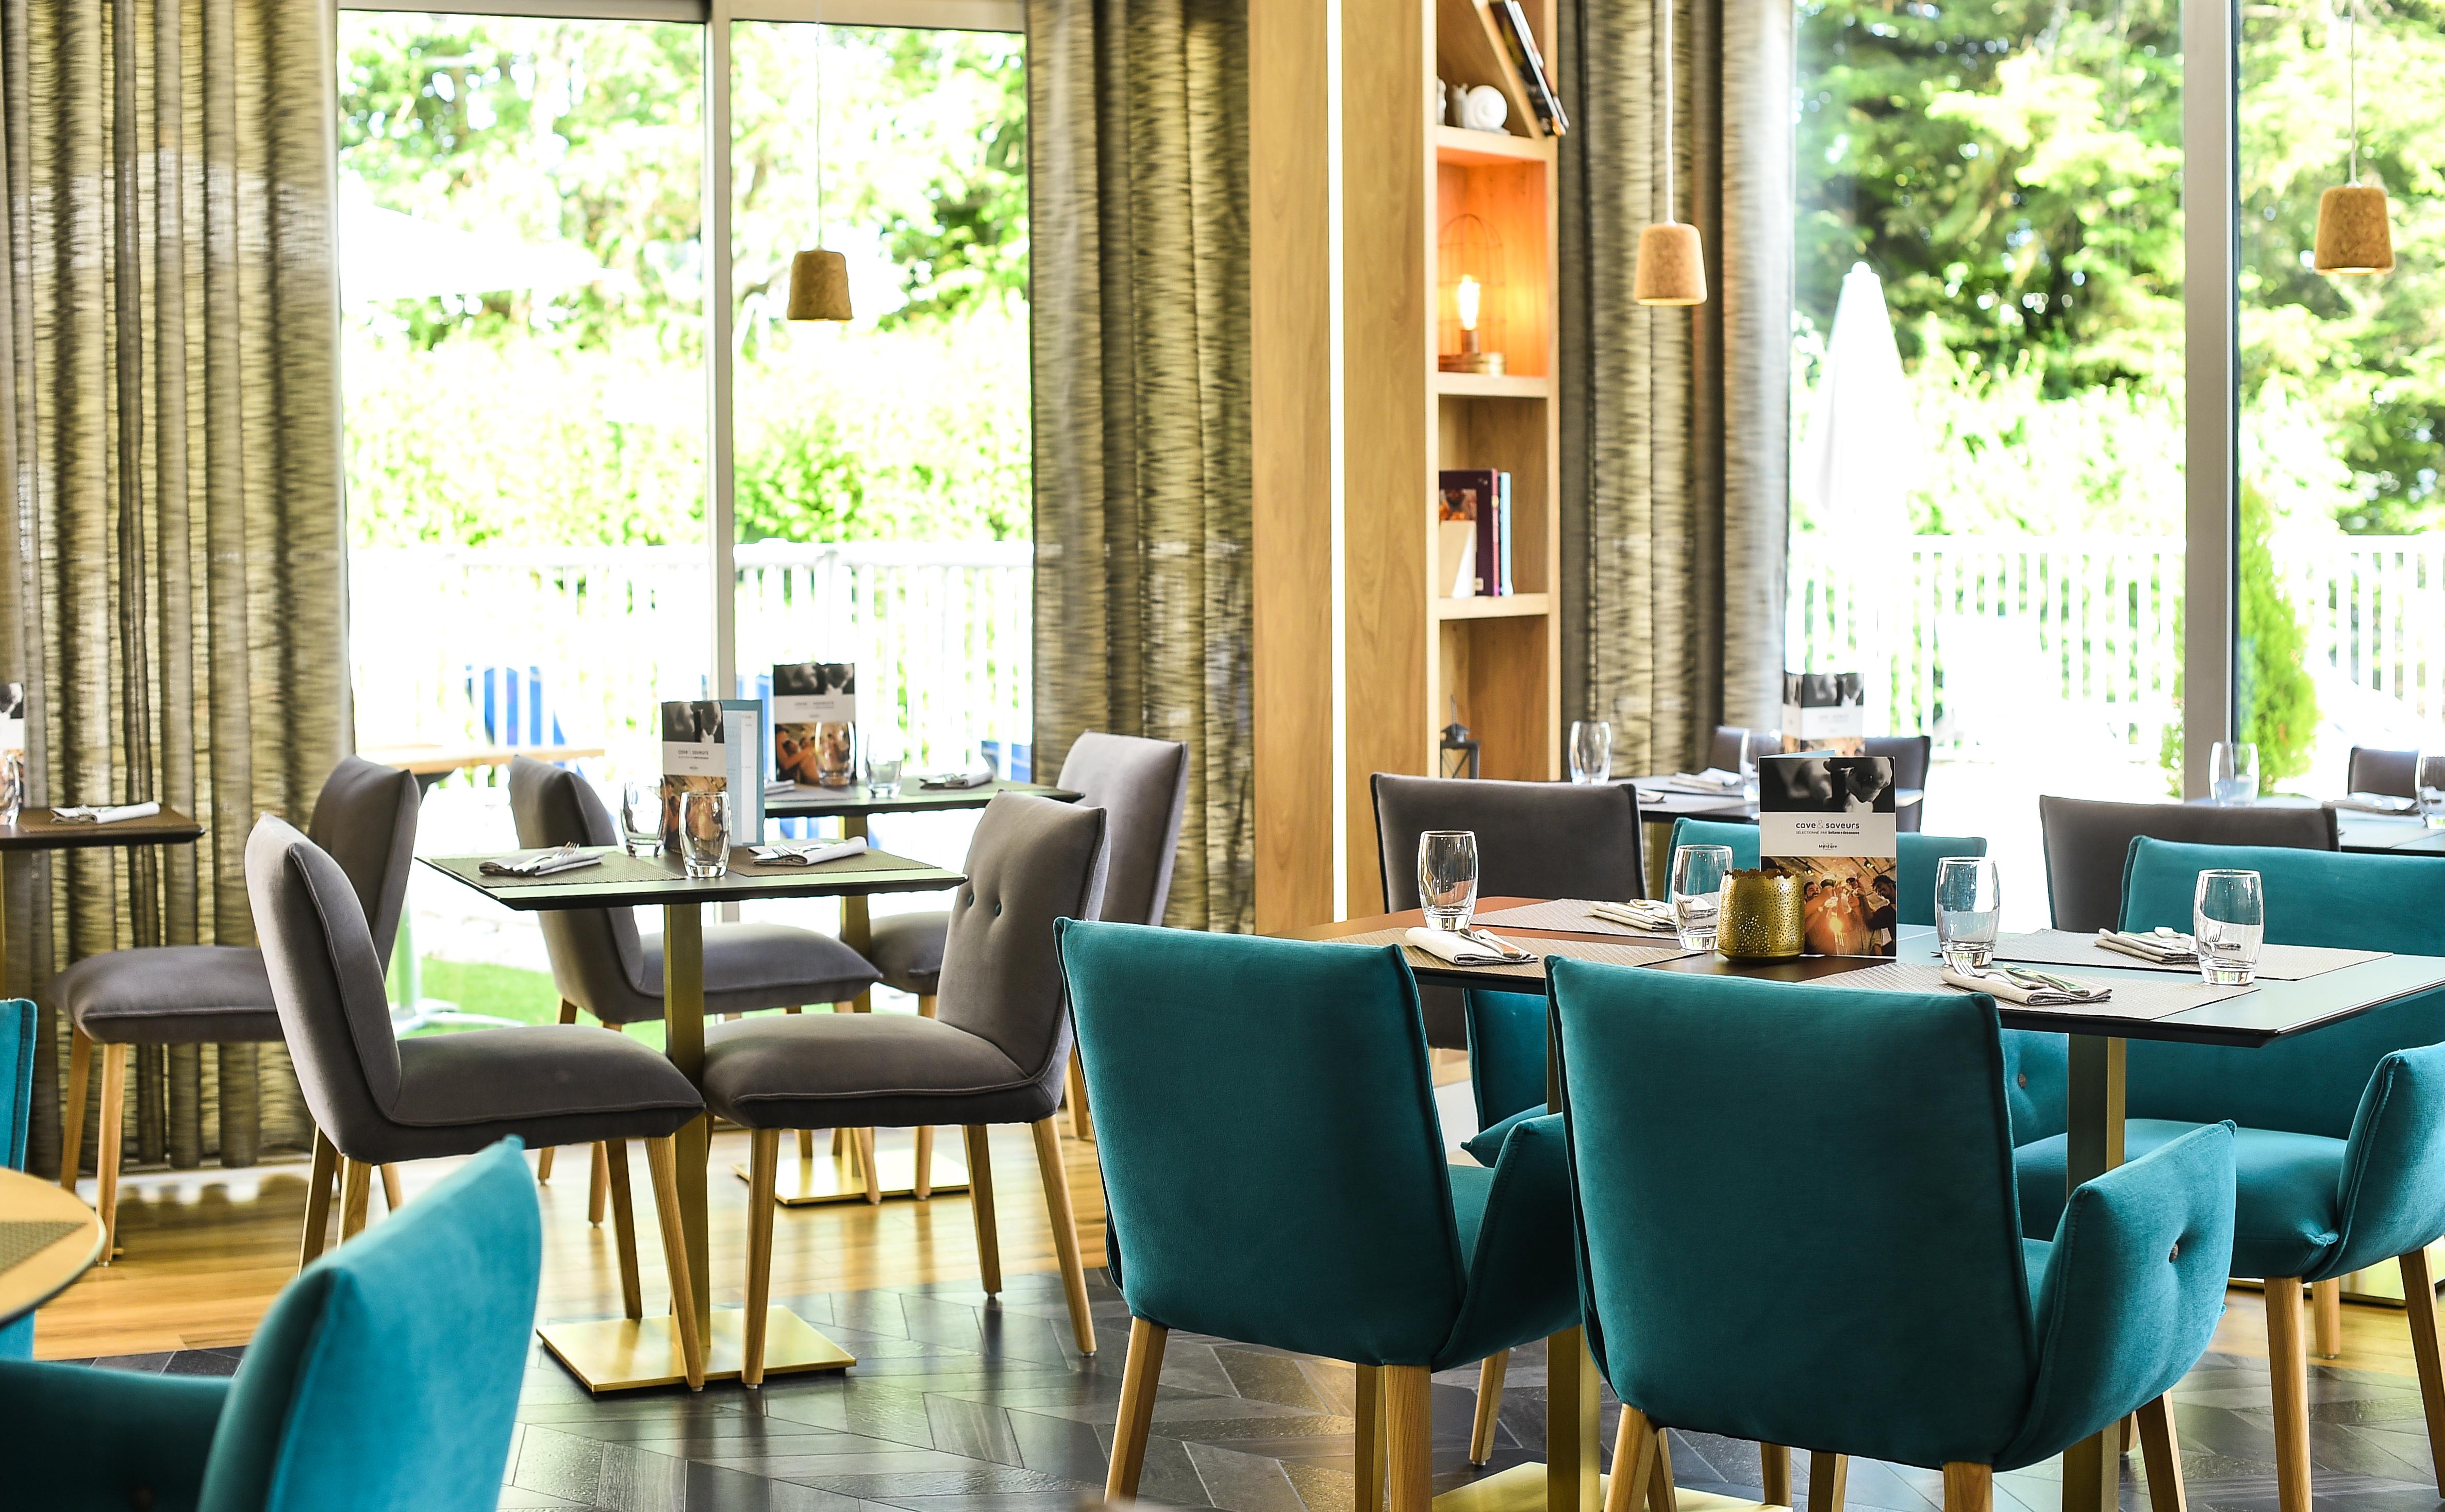 M7 Restaurant - Photo n°1